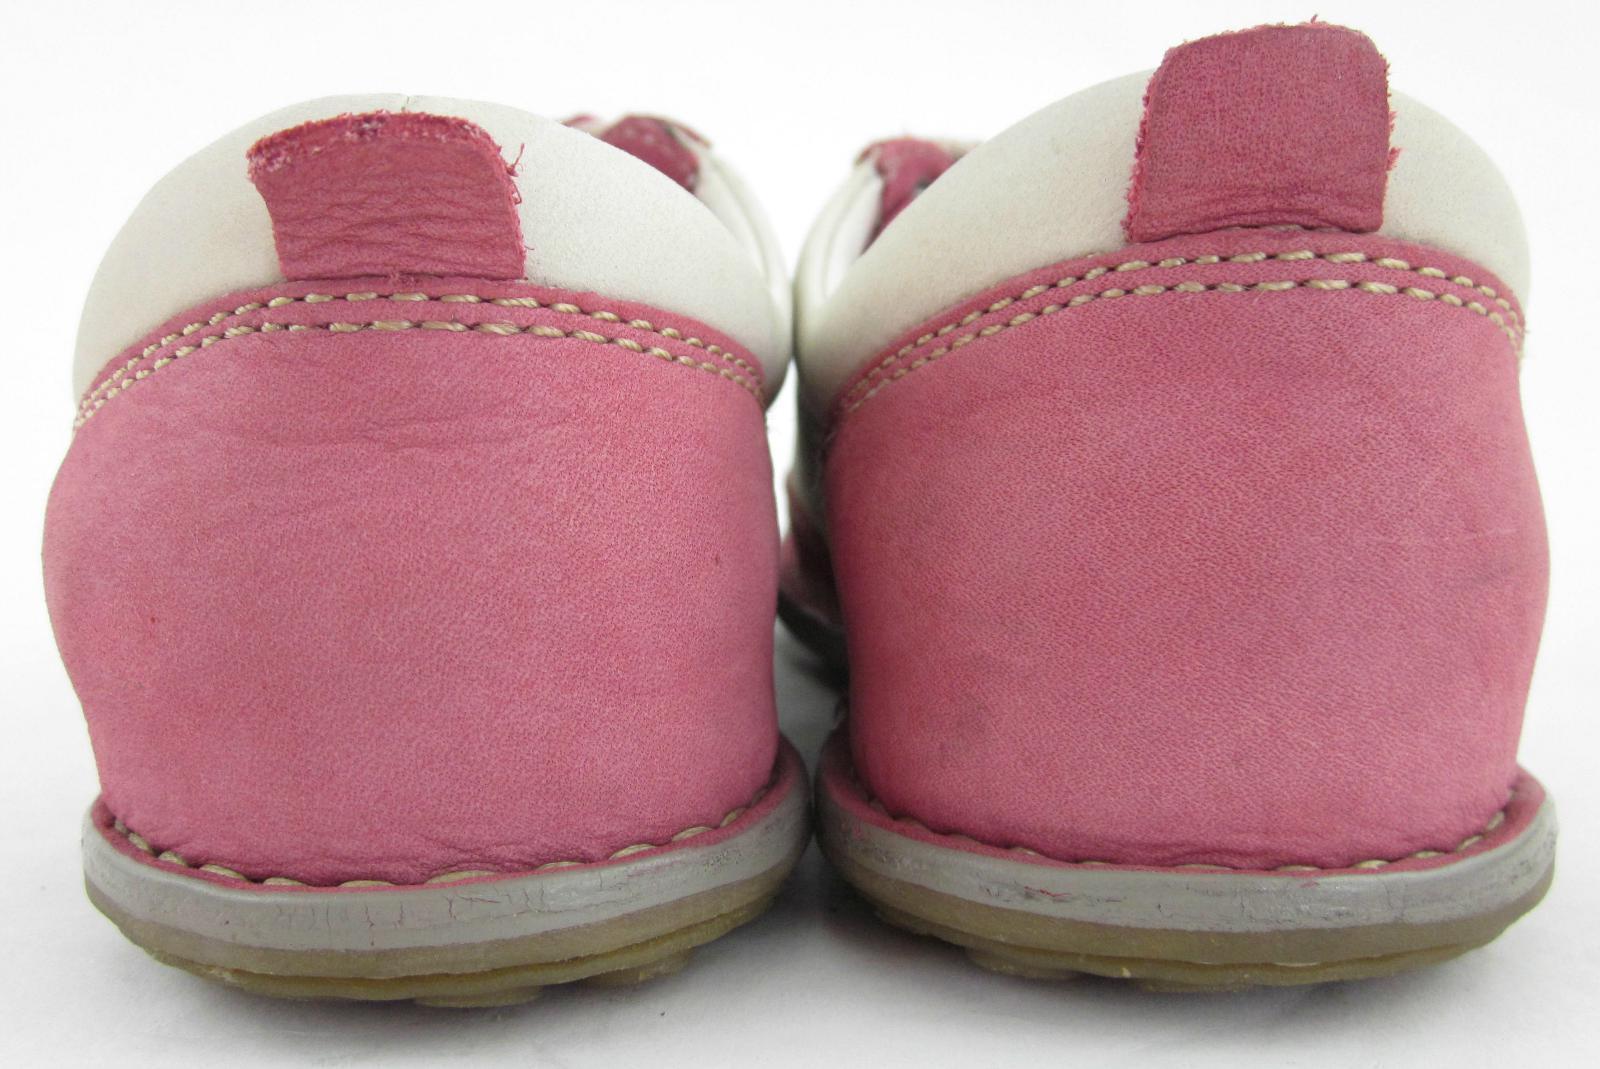 Born Damenschuhe Wingtip Style Schuhes Dusty Rose Pink Pink Rose Cream Leder Sz 6.5 55bd18